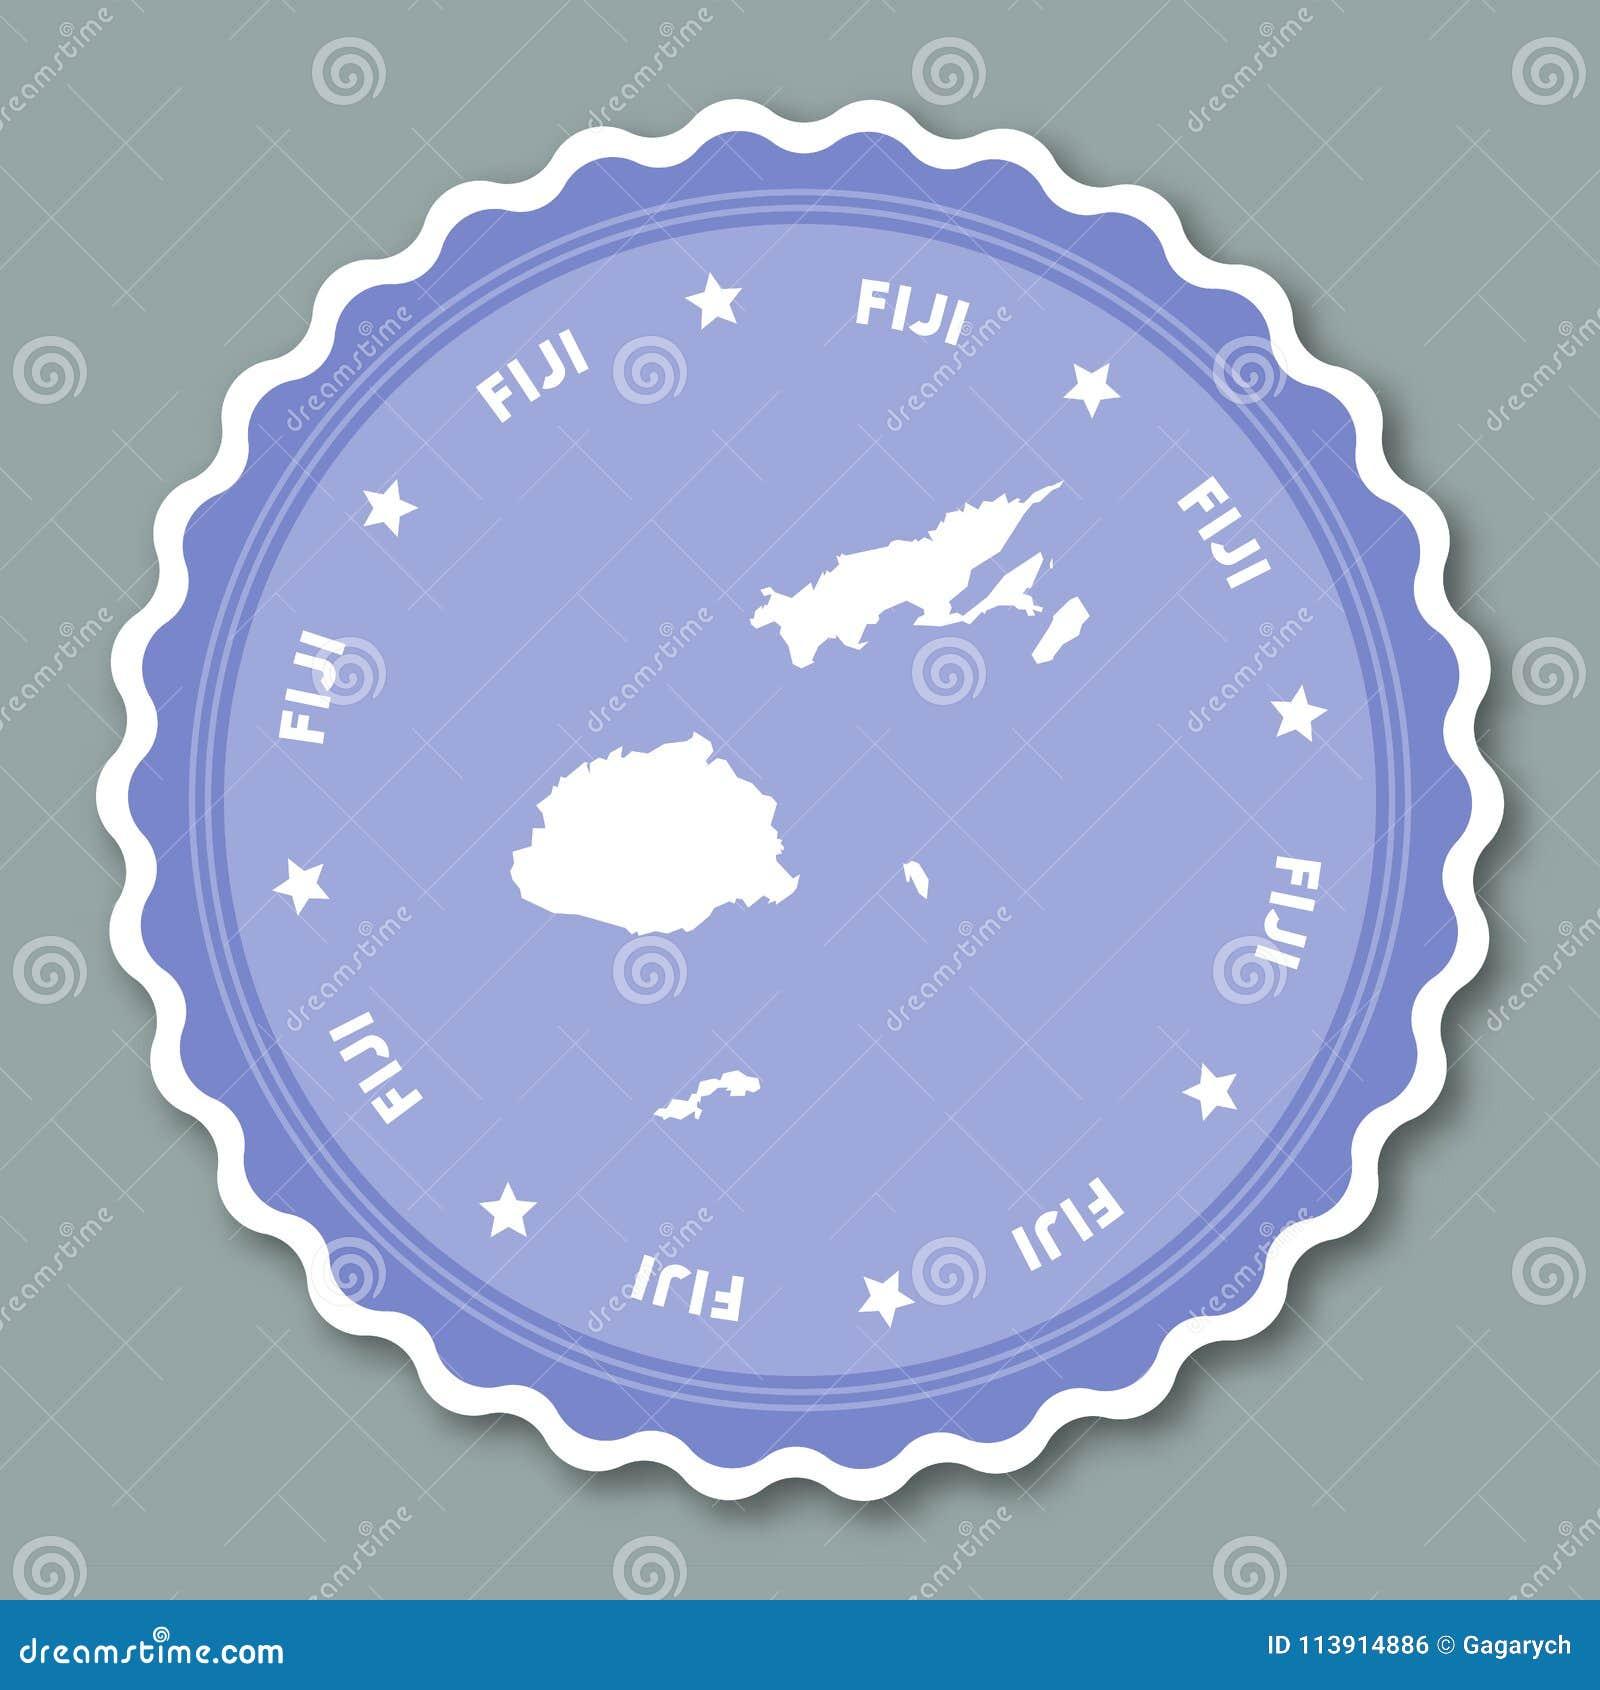 Fiji sticker flat design. stock vector. Illustration of ...